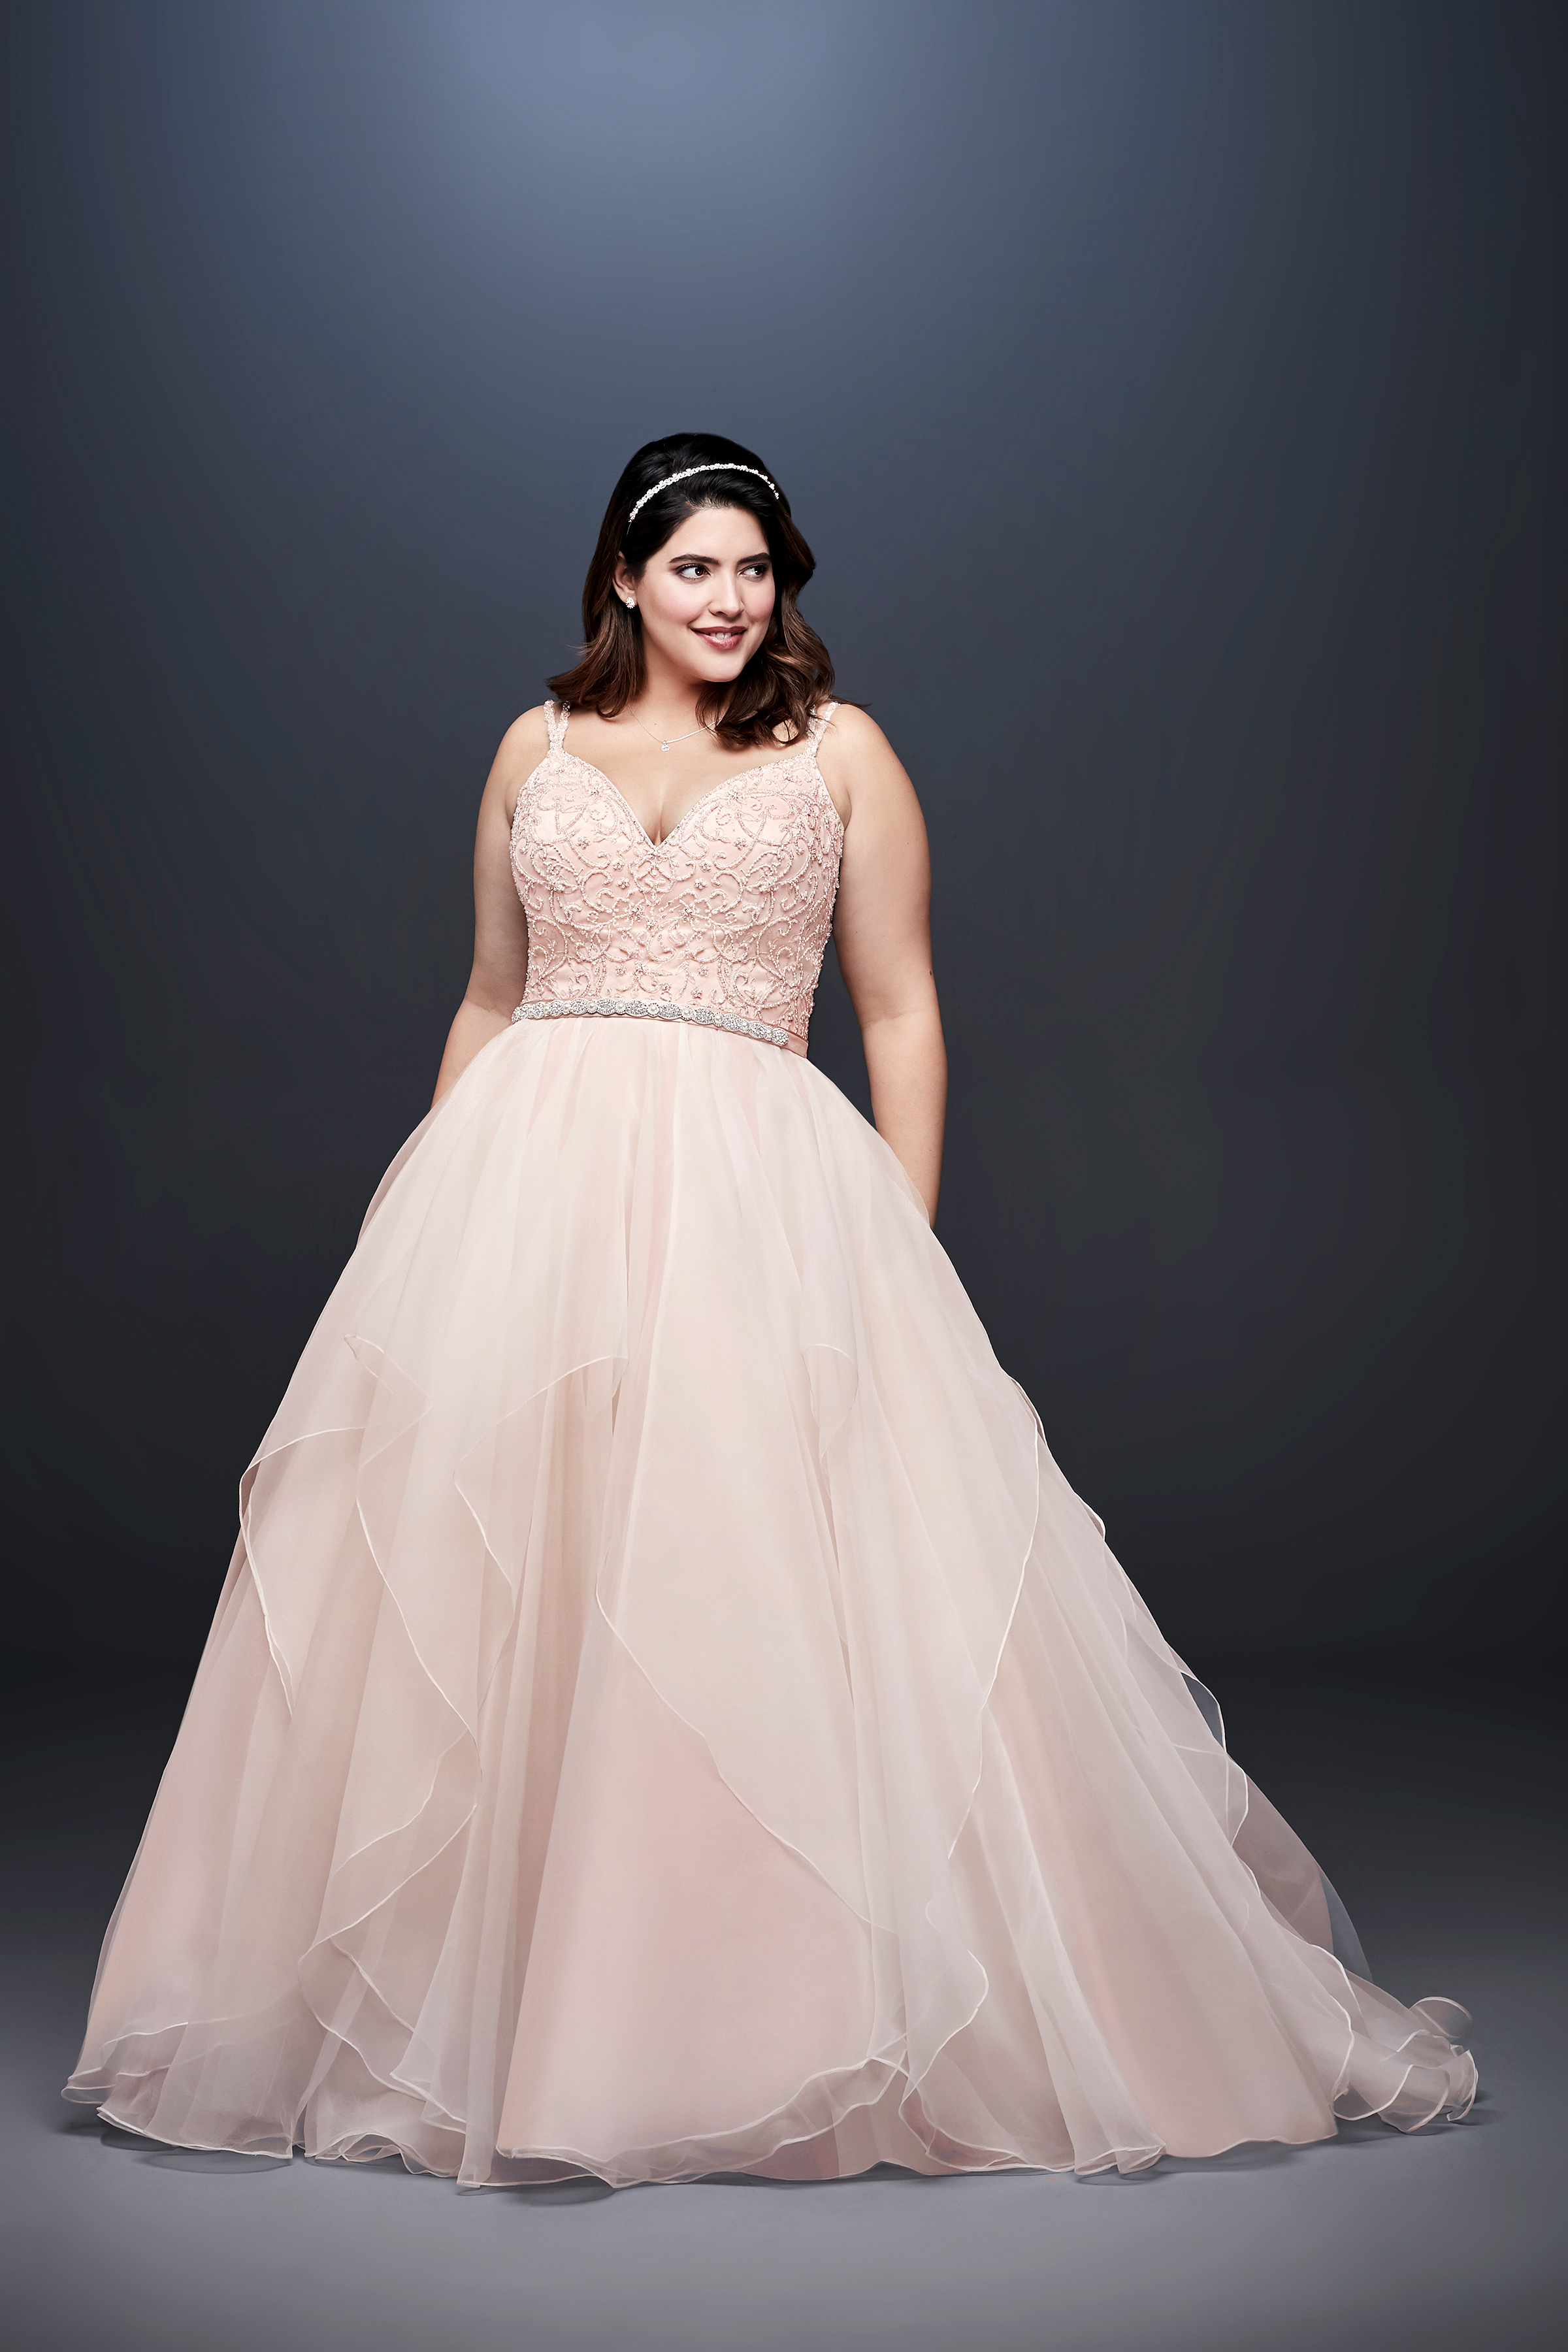 david bridal wedding dress spring 2019 sleeveless blush a-line